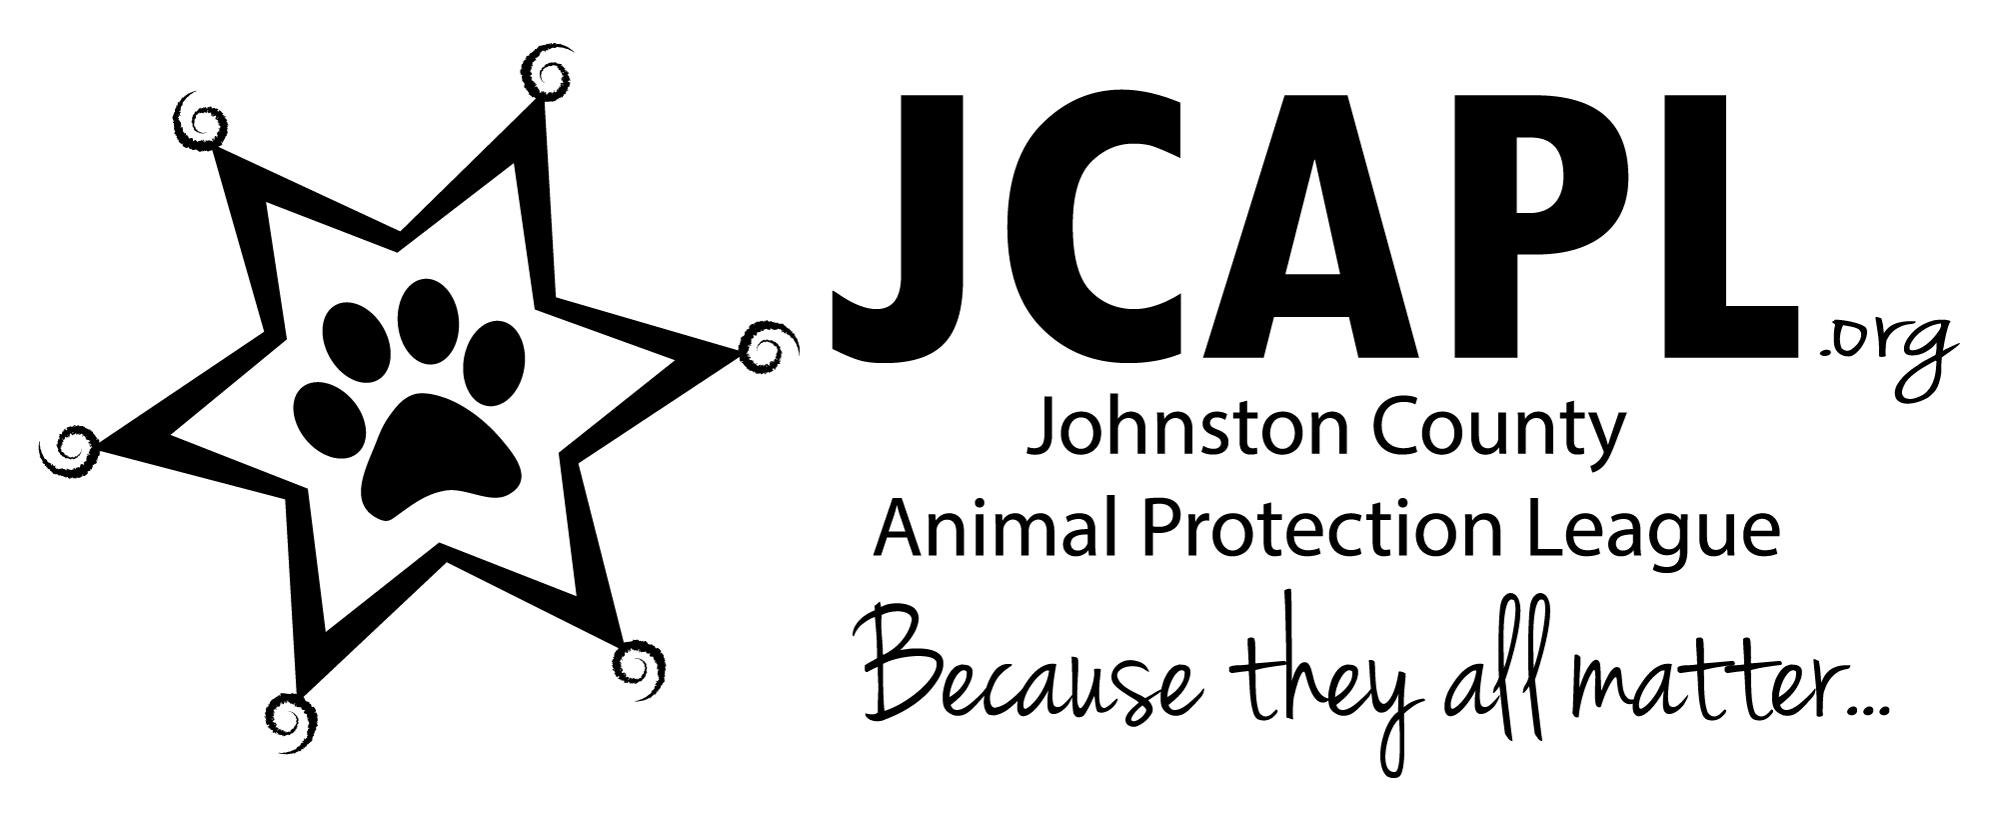 Sponsor Johnston County Animal Protection League